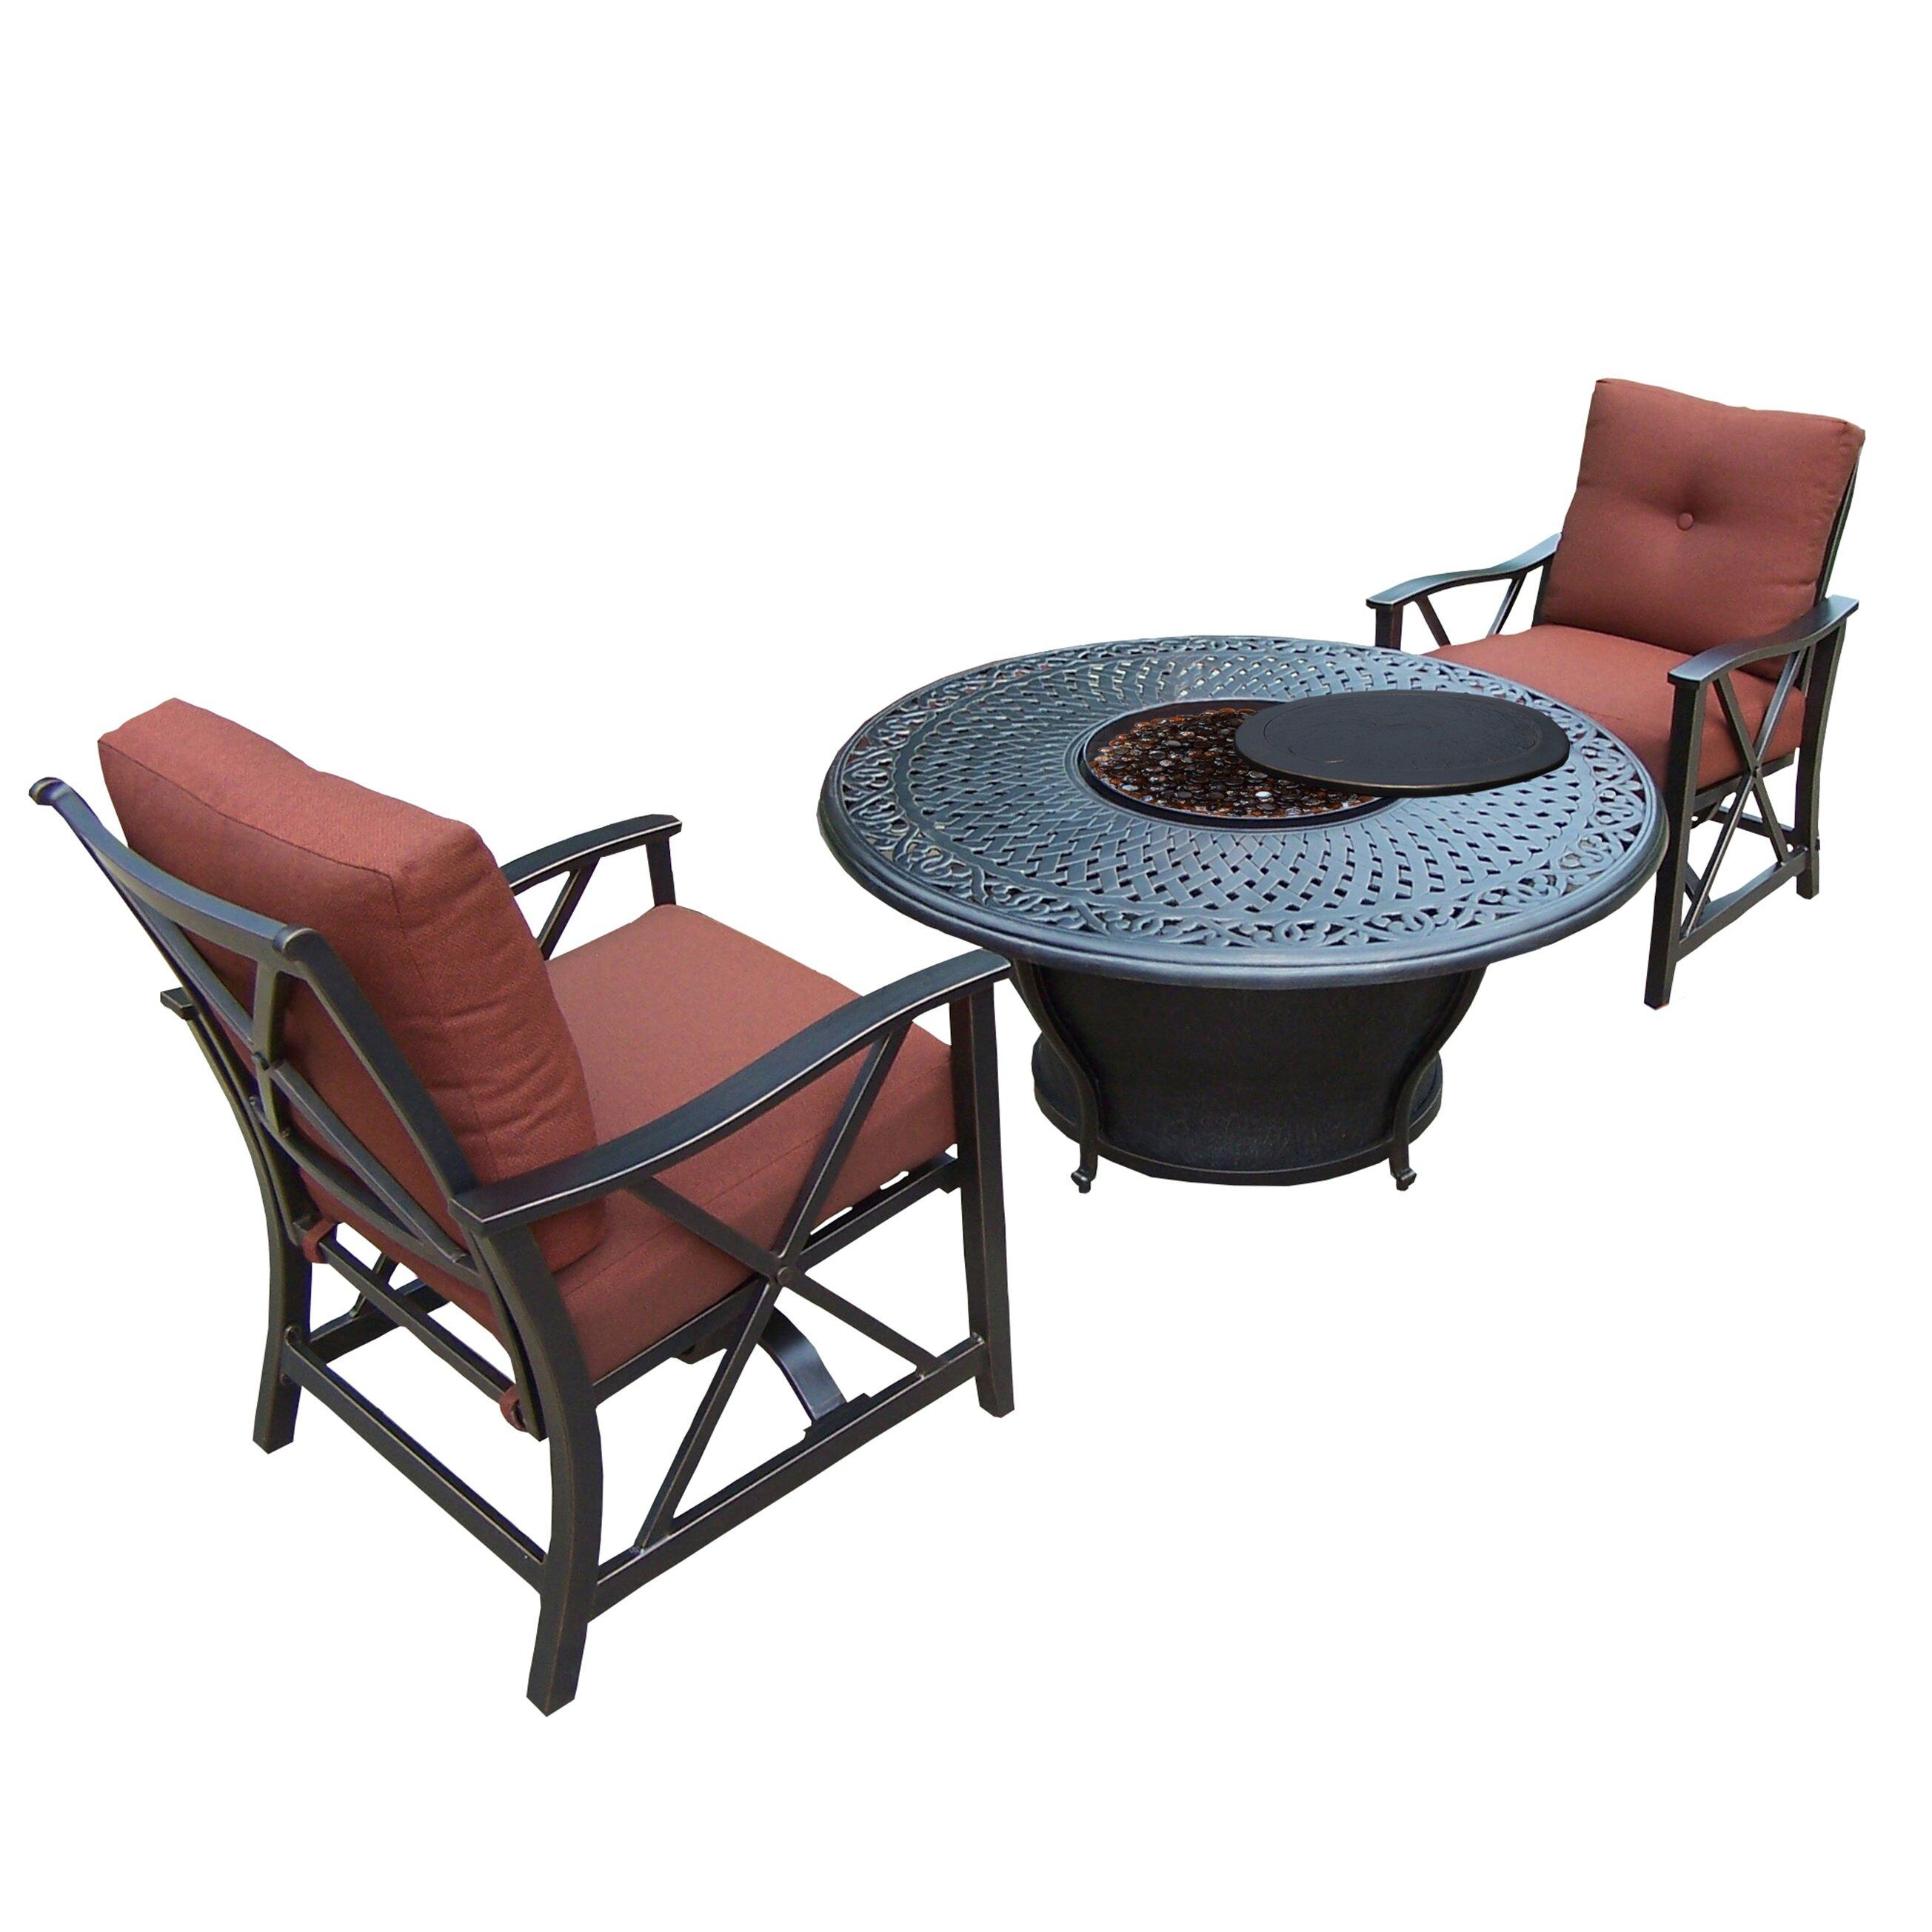 Darby Home Co Owego 3 Piece Conversation Set with Cushions Reviews